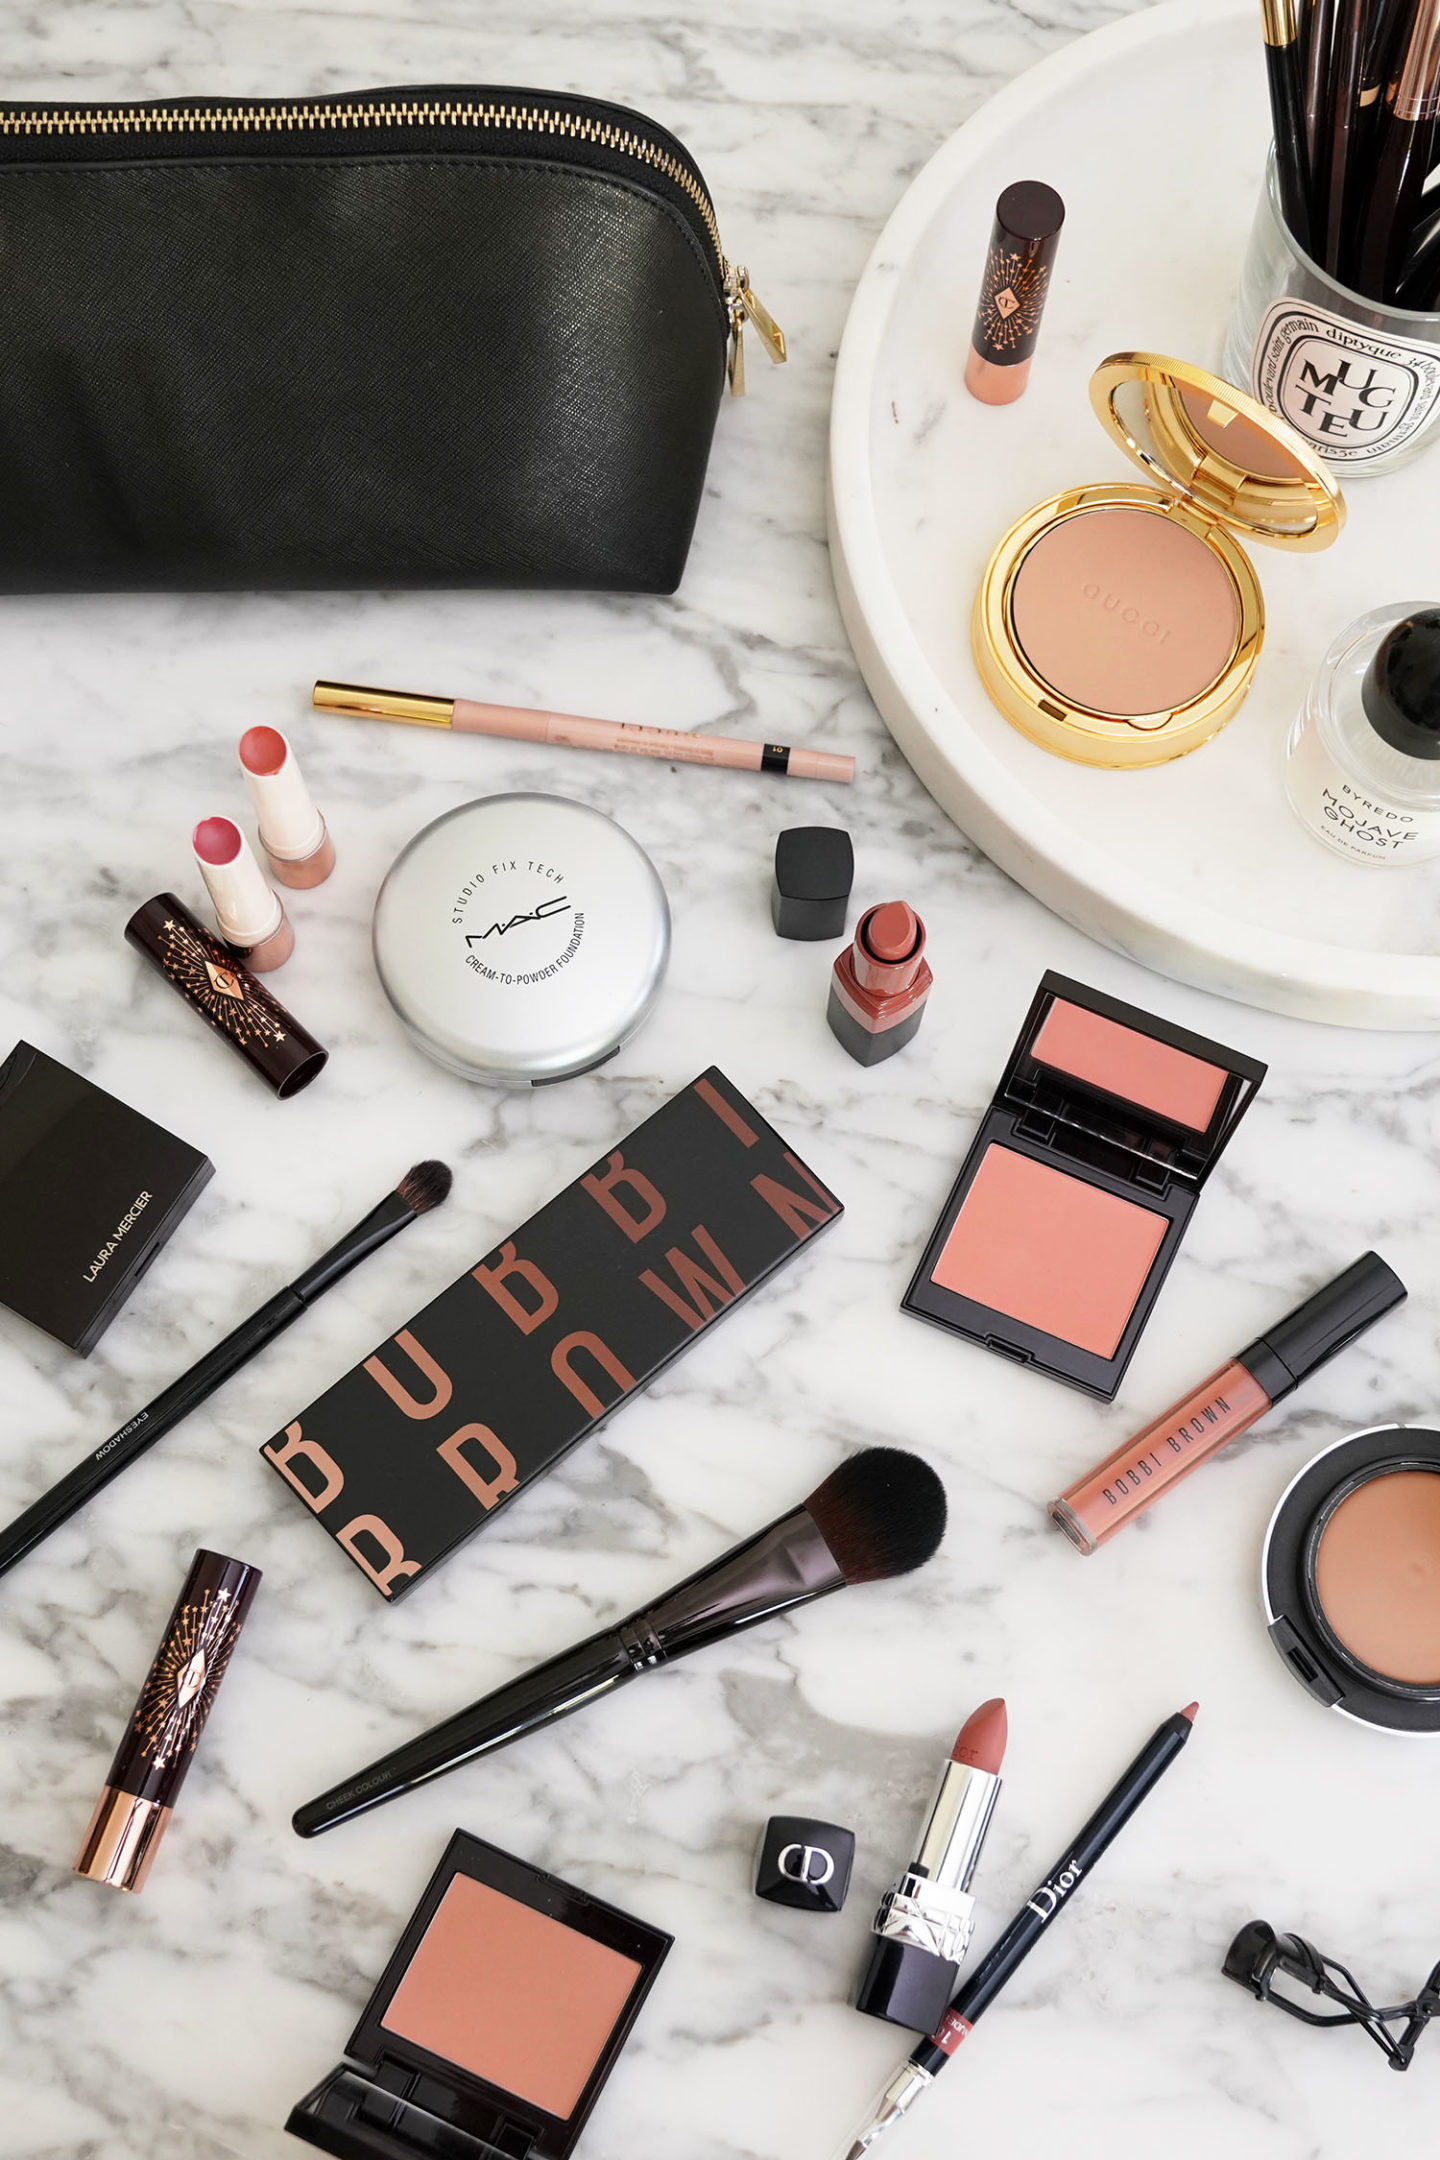 Nordstrom Spring Beauty lance MAC, Charlotte Tilbury, Bobbi Brown |  Le Lookbook Beauté